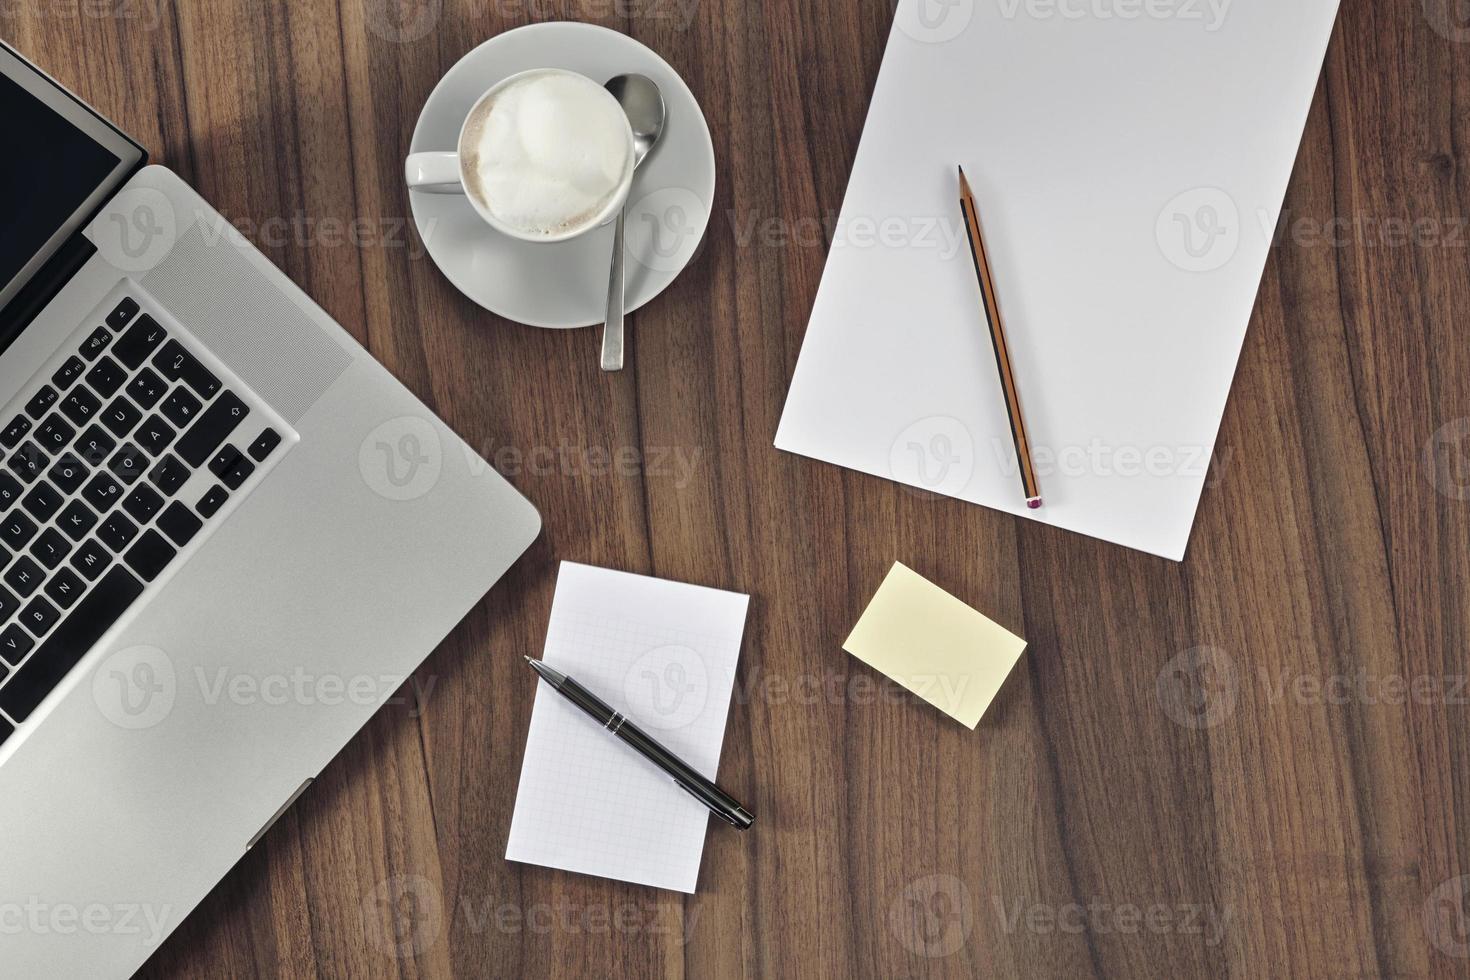 bureau avec documents photo